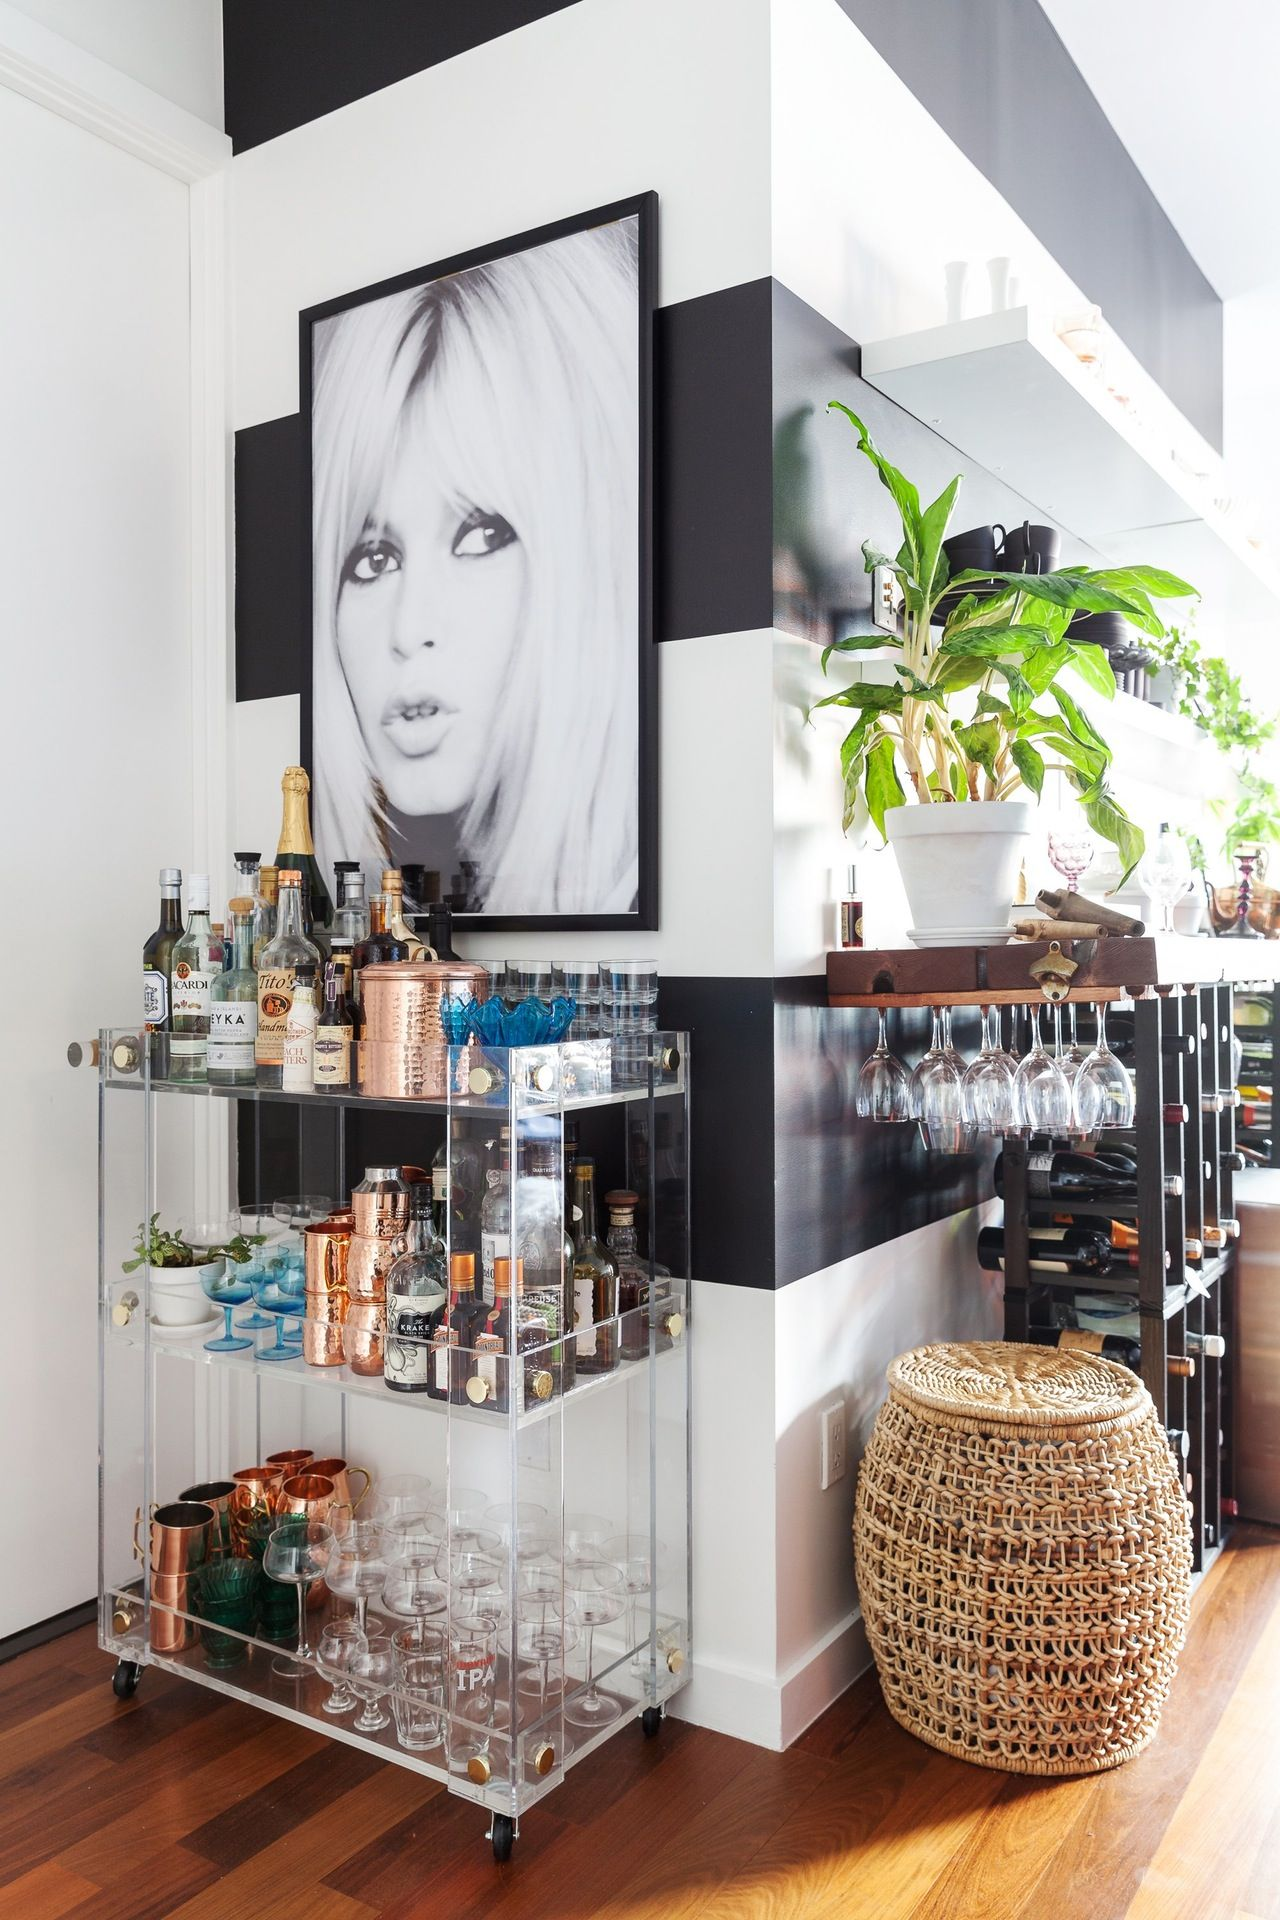 Sarah S Small Stylish Brooklyn Apartment Home Bar Decor